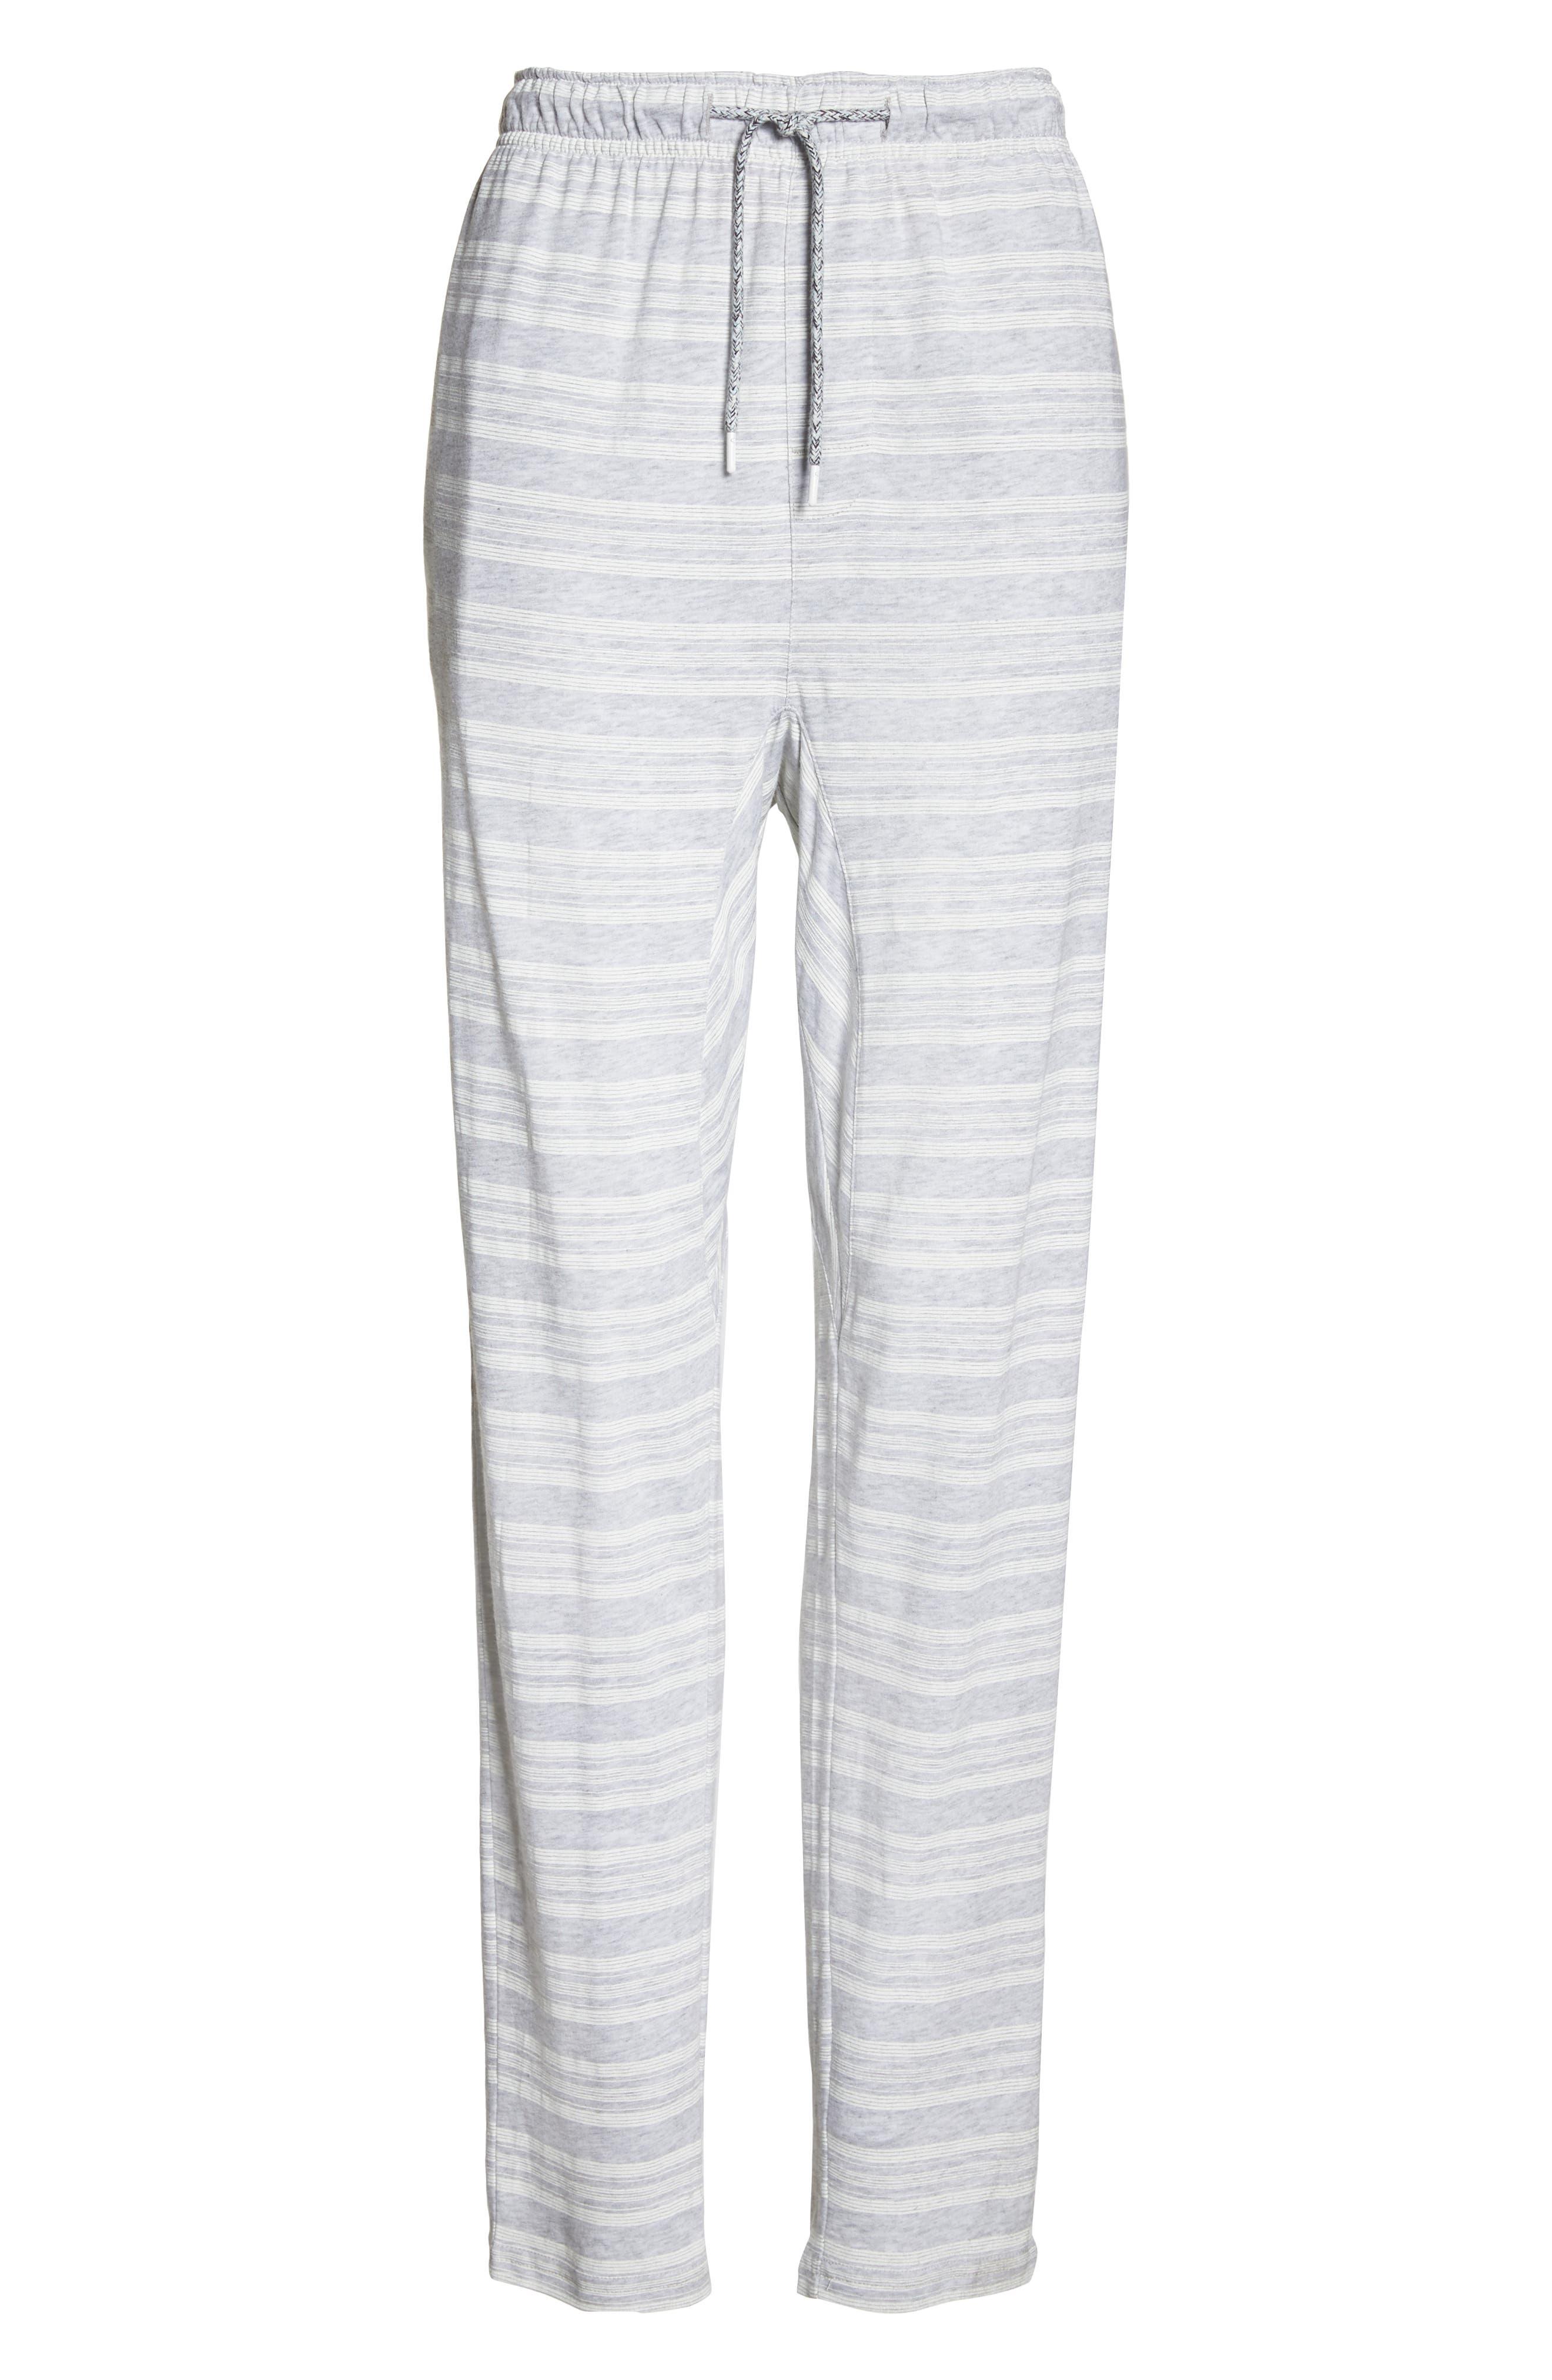 Alice Pajama Pants,                             Alternate thumbnail 6, color,                             LOLLY STRIPE WHITE